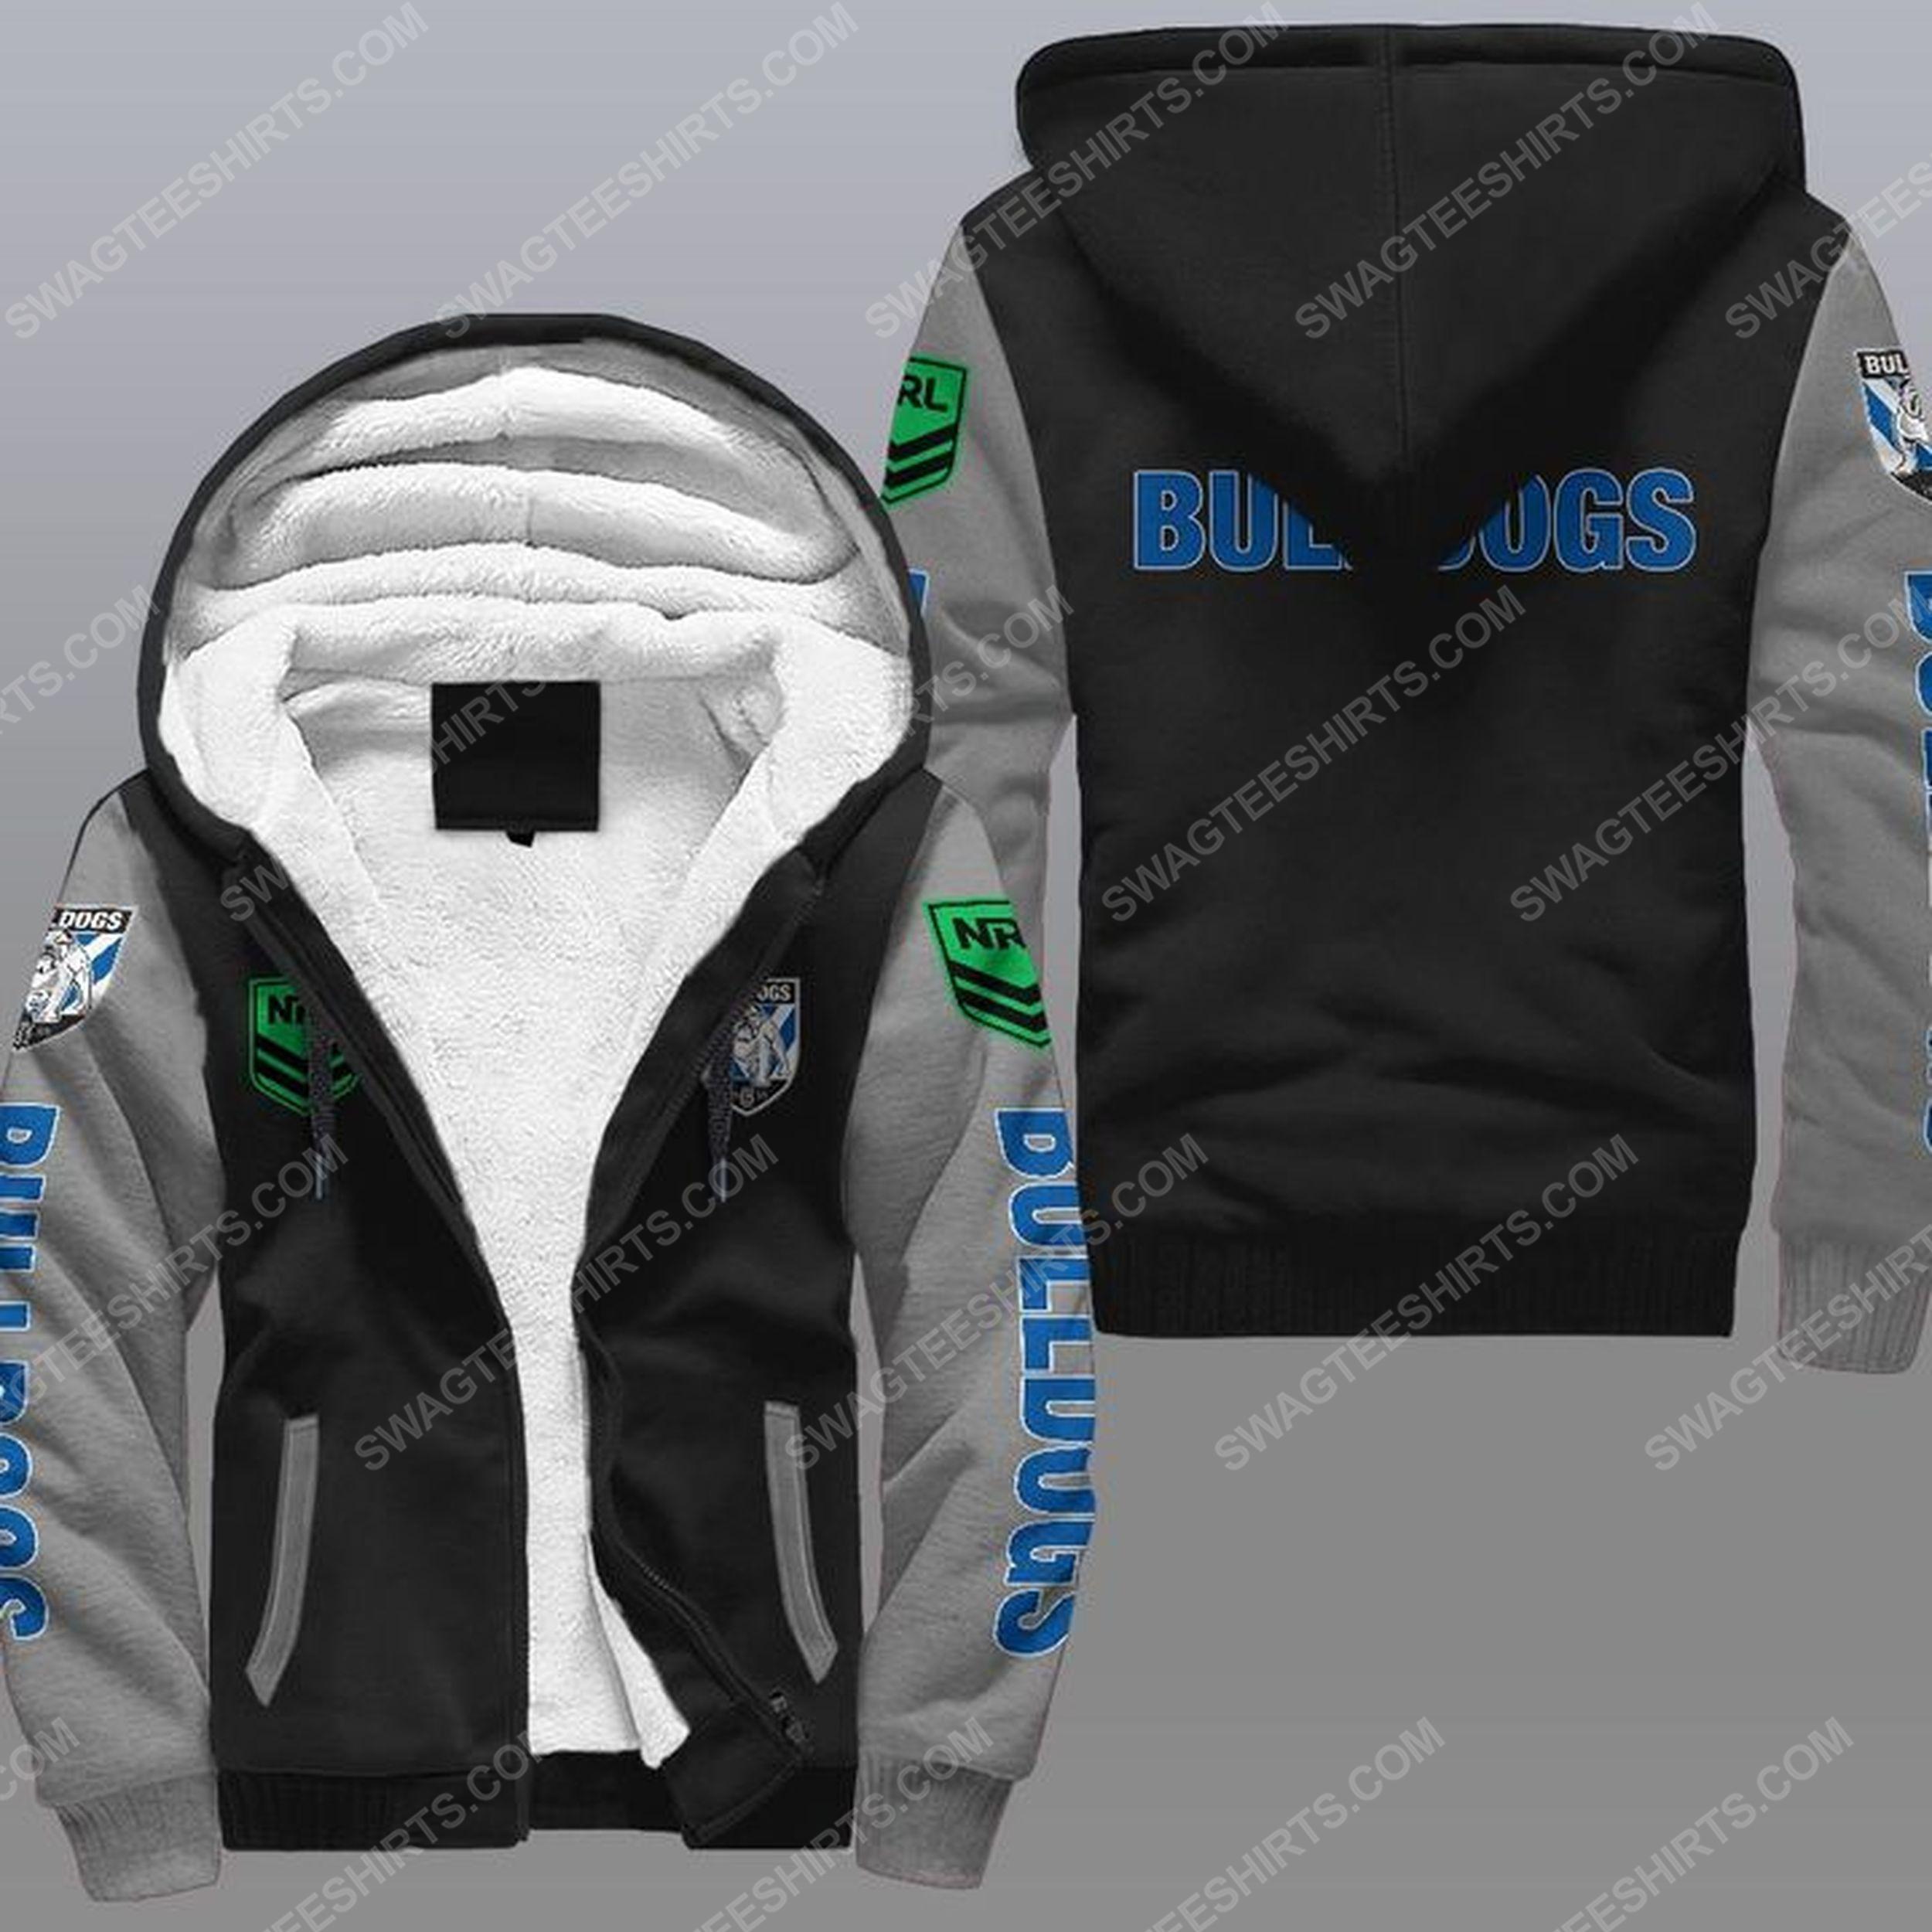 Canterbury-bankstown bulldogs all over print fleece hoodie - gray 1